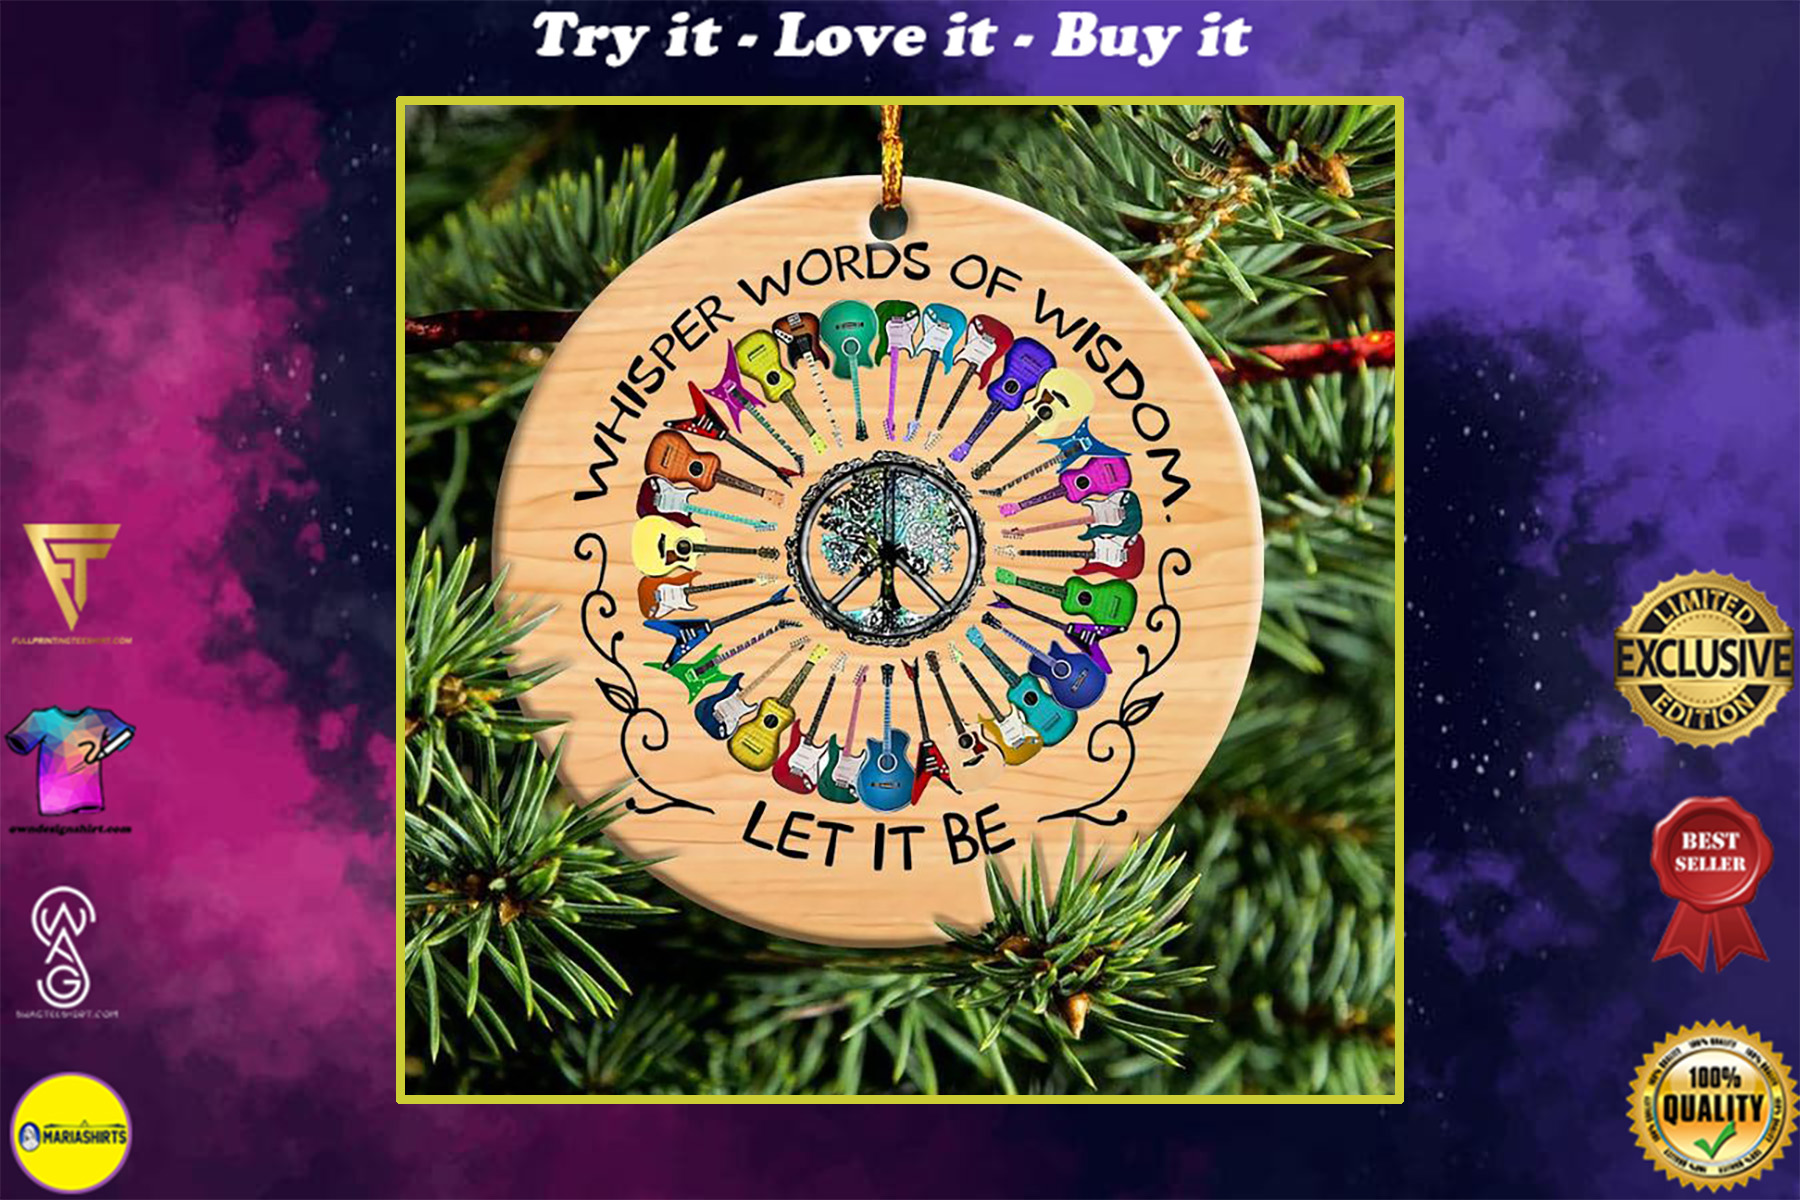 whisper word of wisdom guitar peace sign hippie christmas ornament